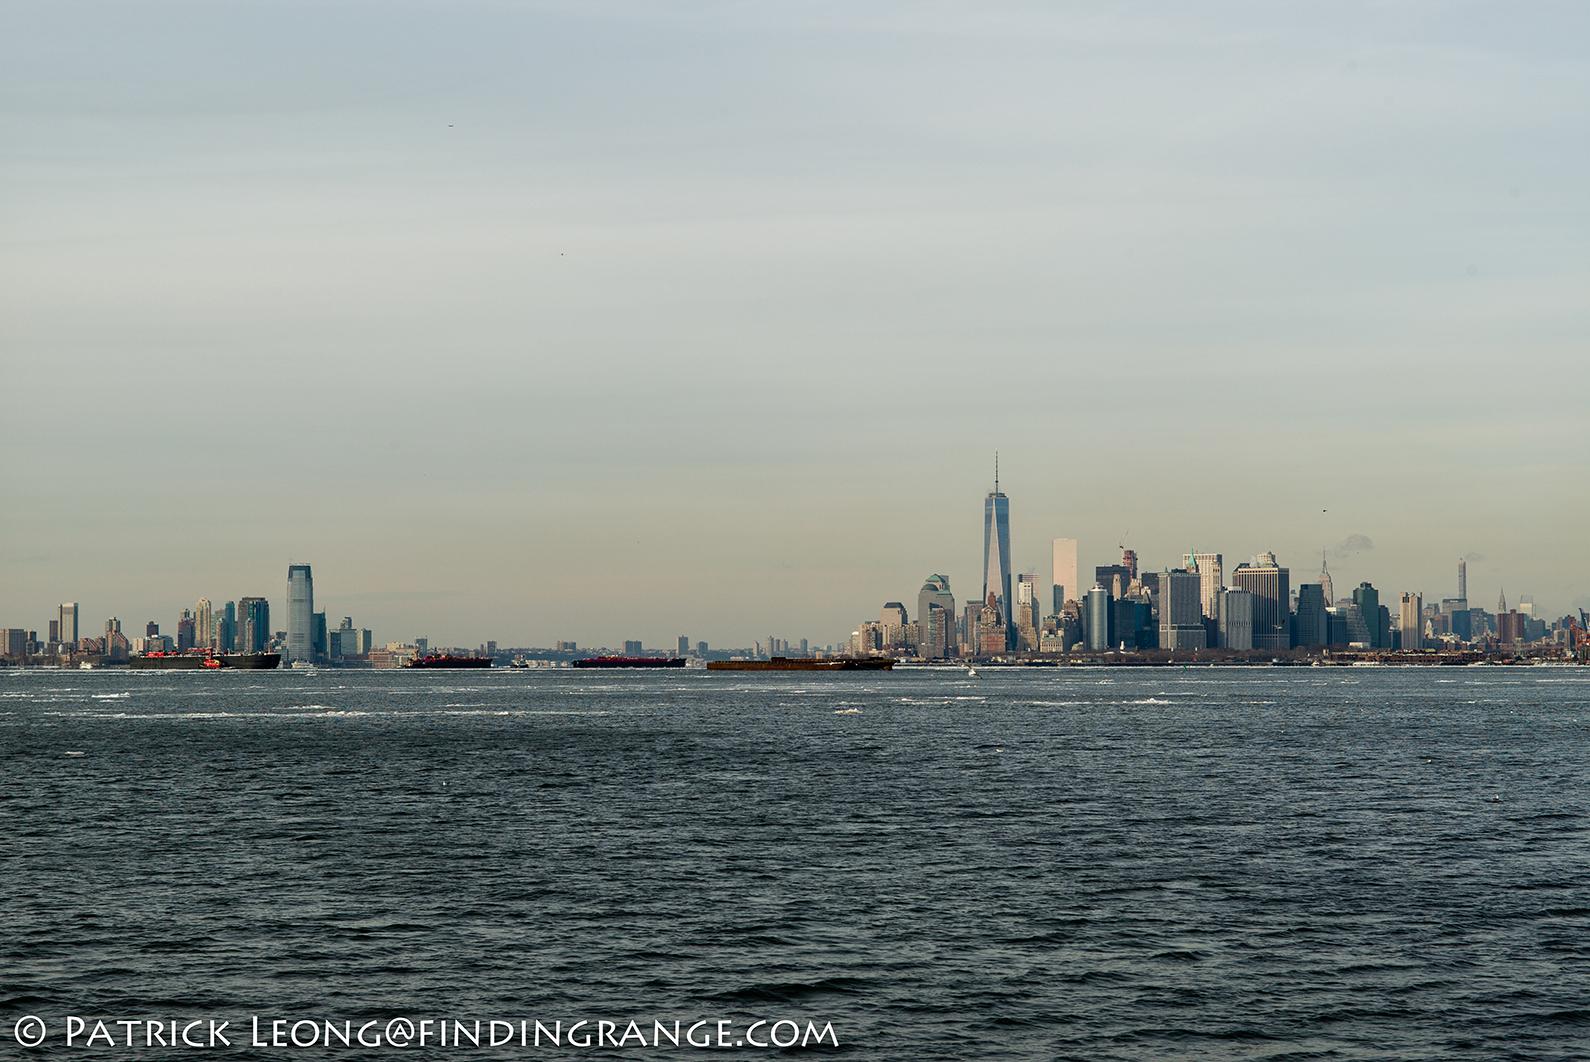 Leica-M-Typ-240-75mm-Summilux-Ice-Harbor-New-York-City